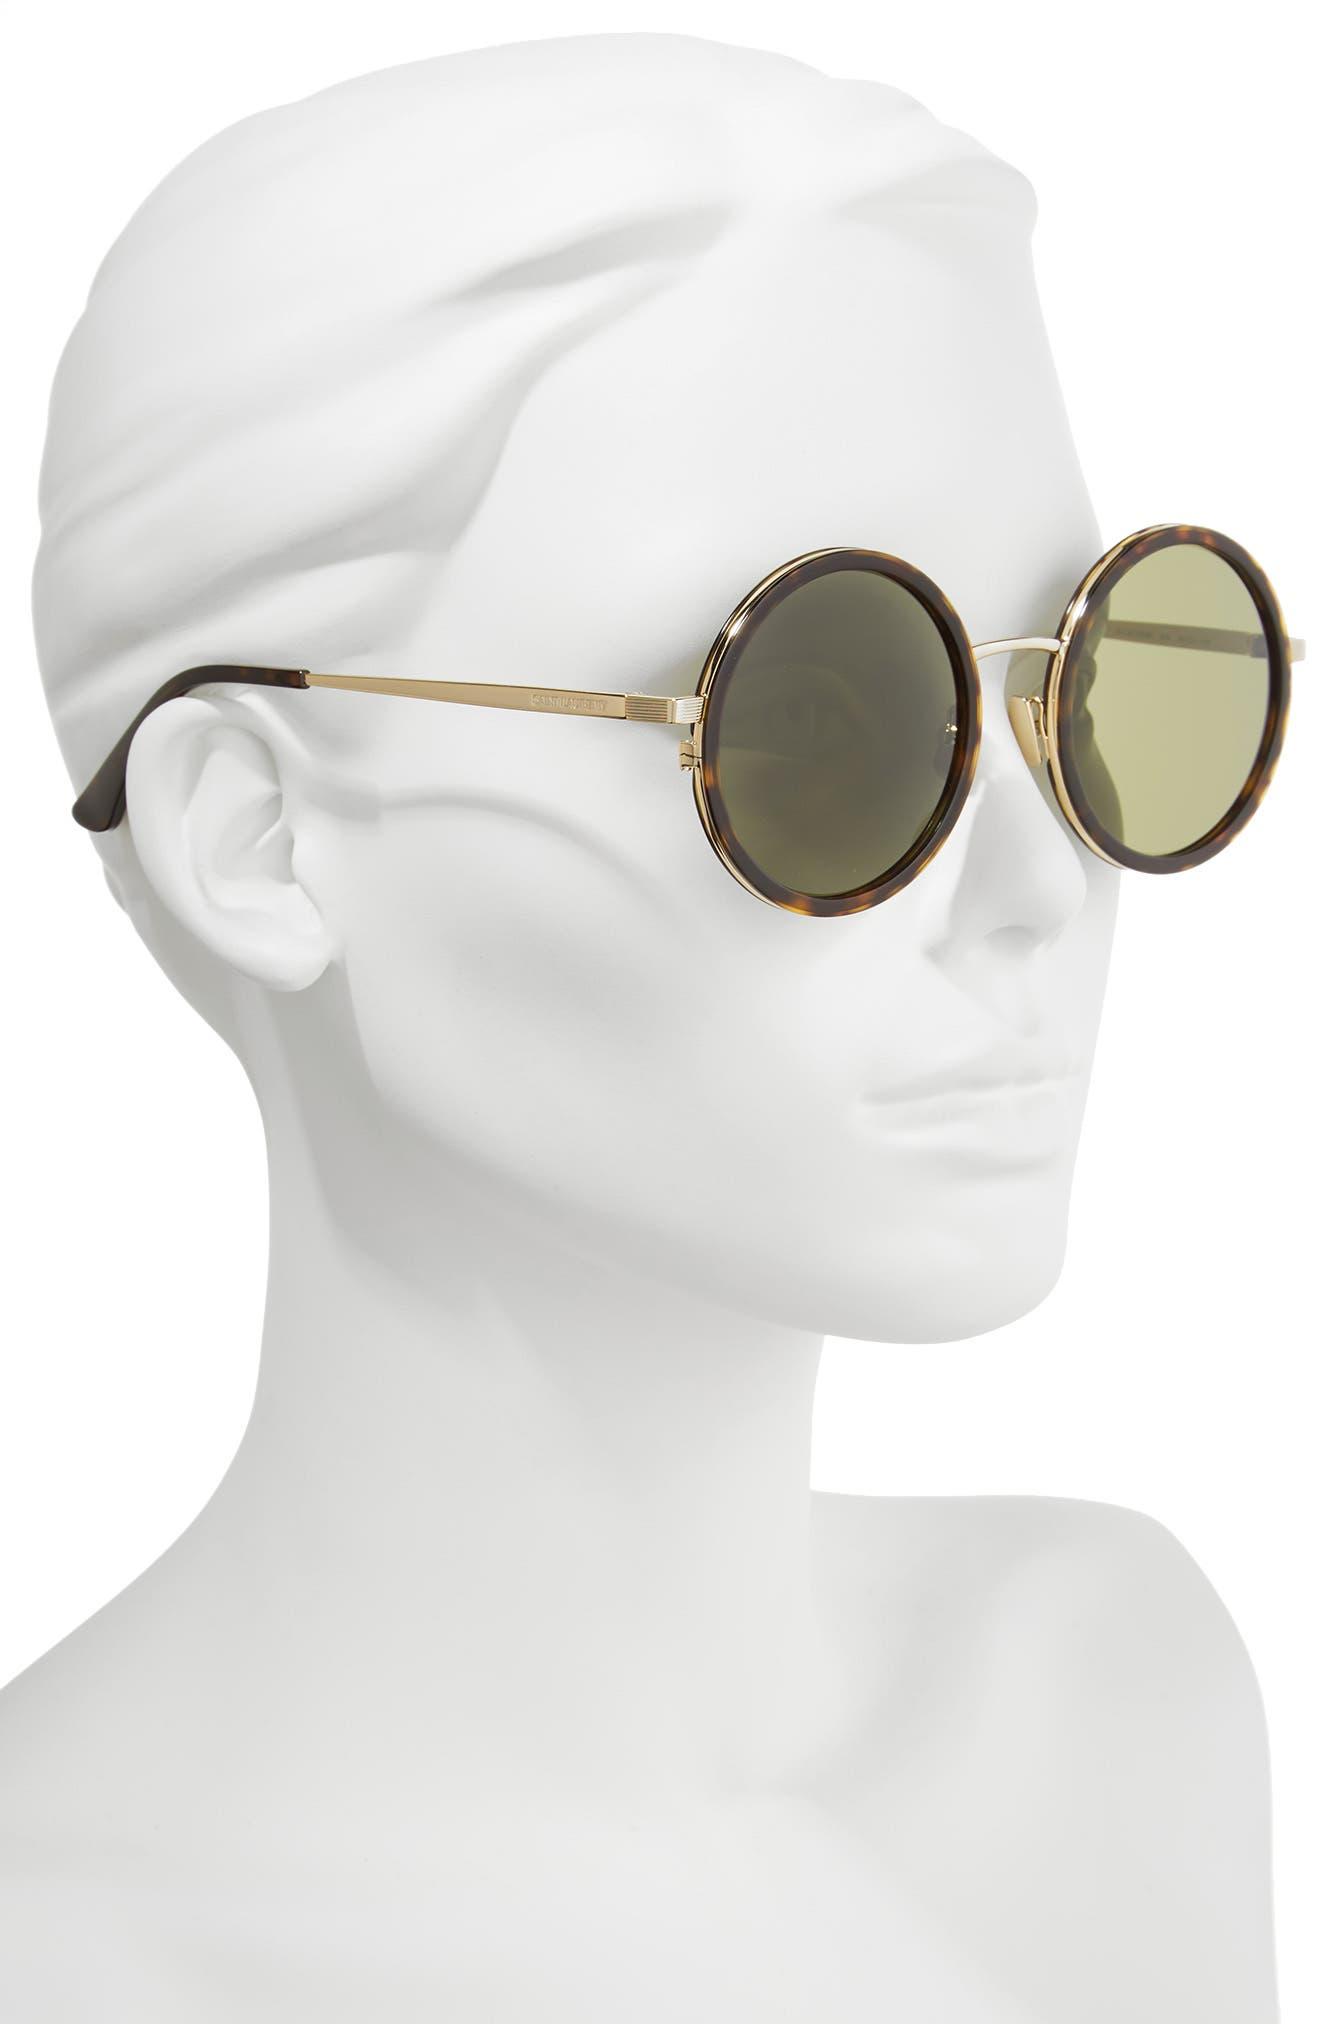 52mm Round Sunglasses,                             Alternate thumbnail 2, color,                             200